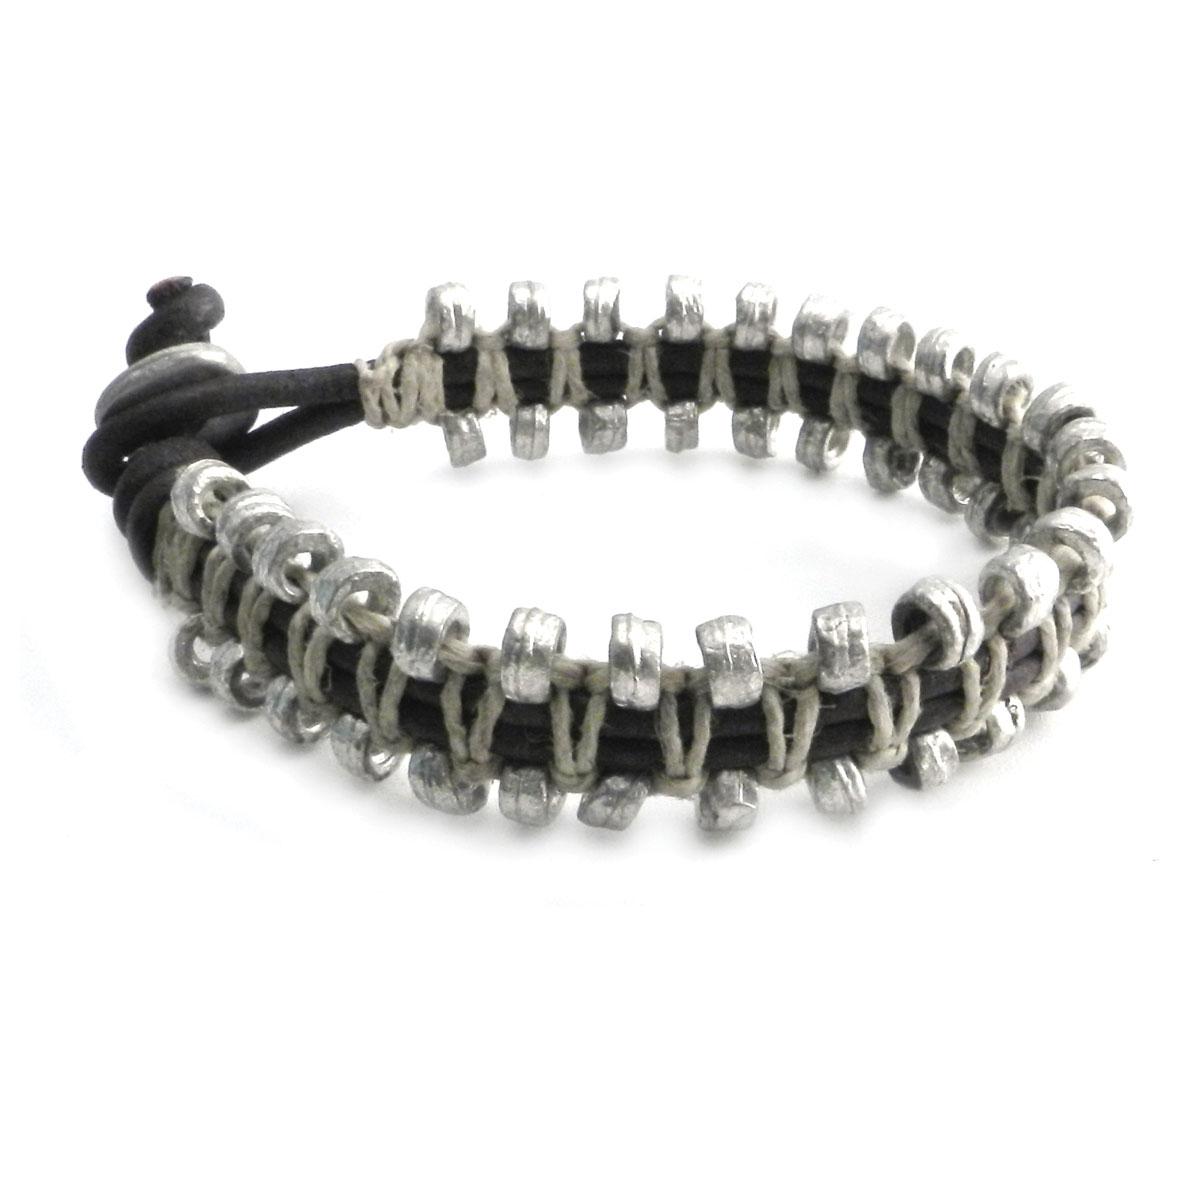 AMiGAZ Snake Chain Leather Bracelet